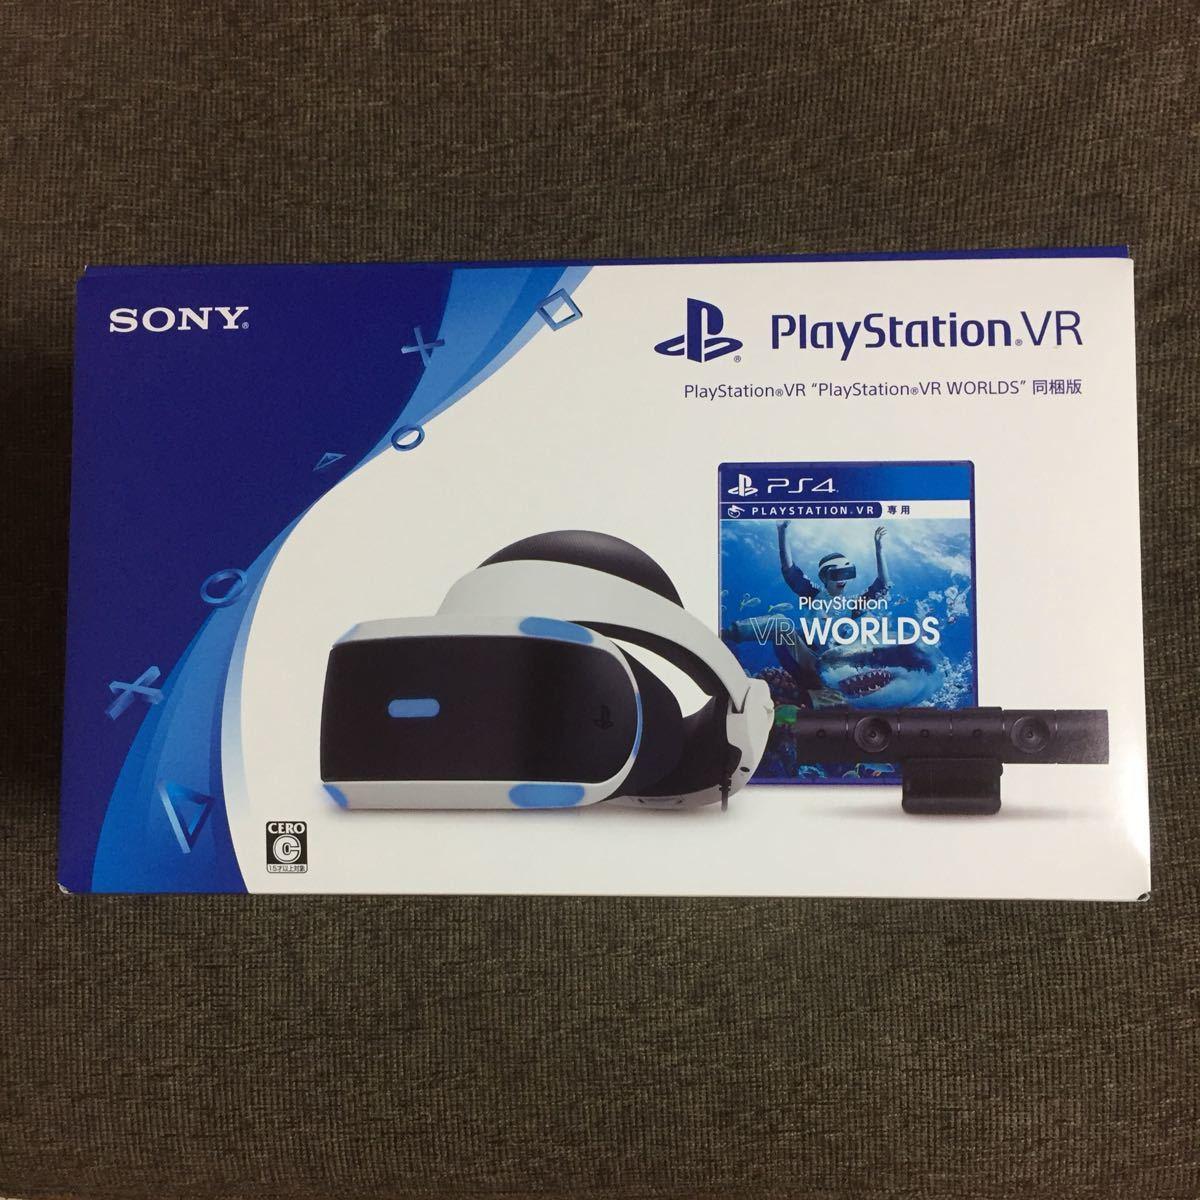 【PS4】 PlayStation VR WORLDS  PSVR本体+ソフト